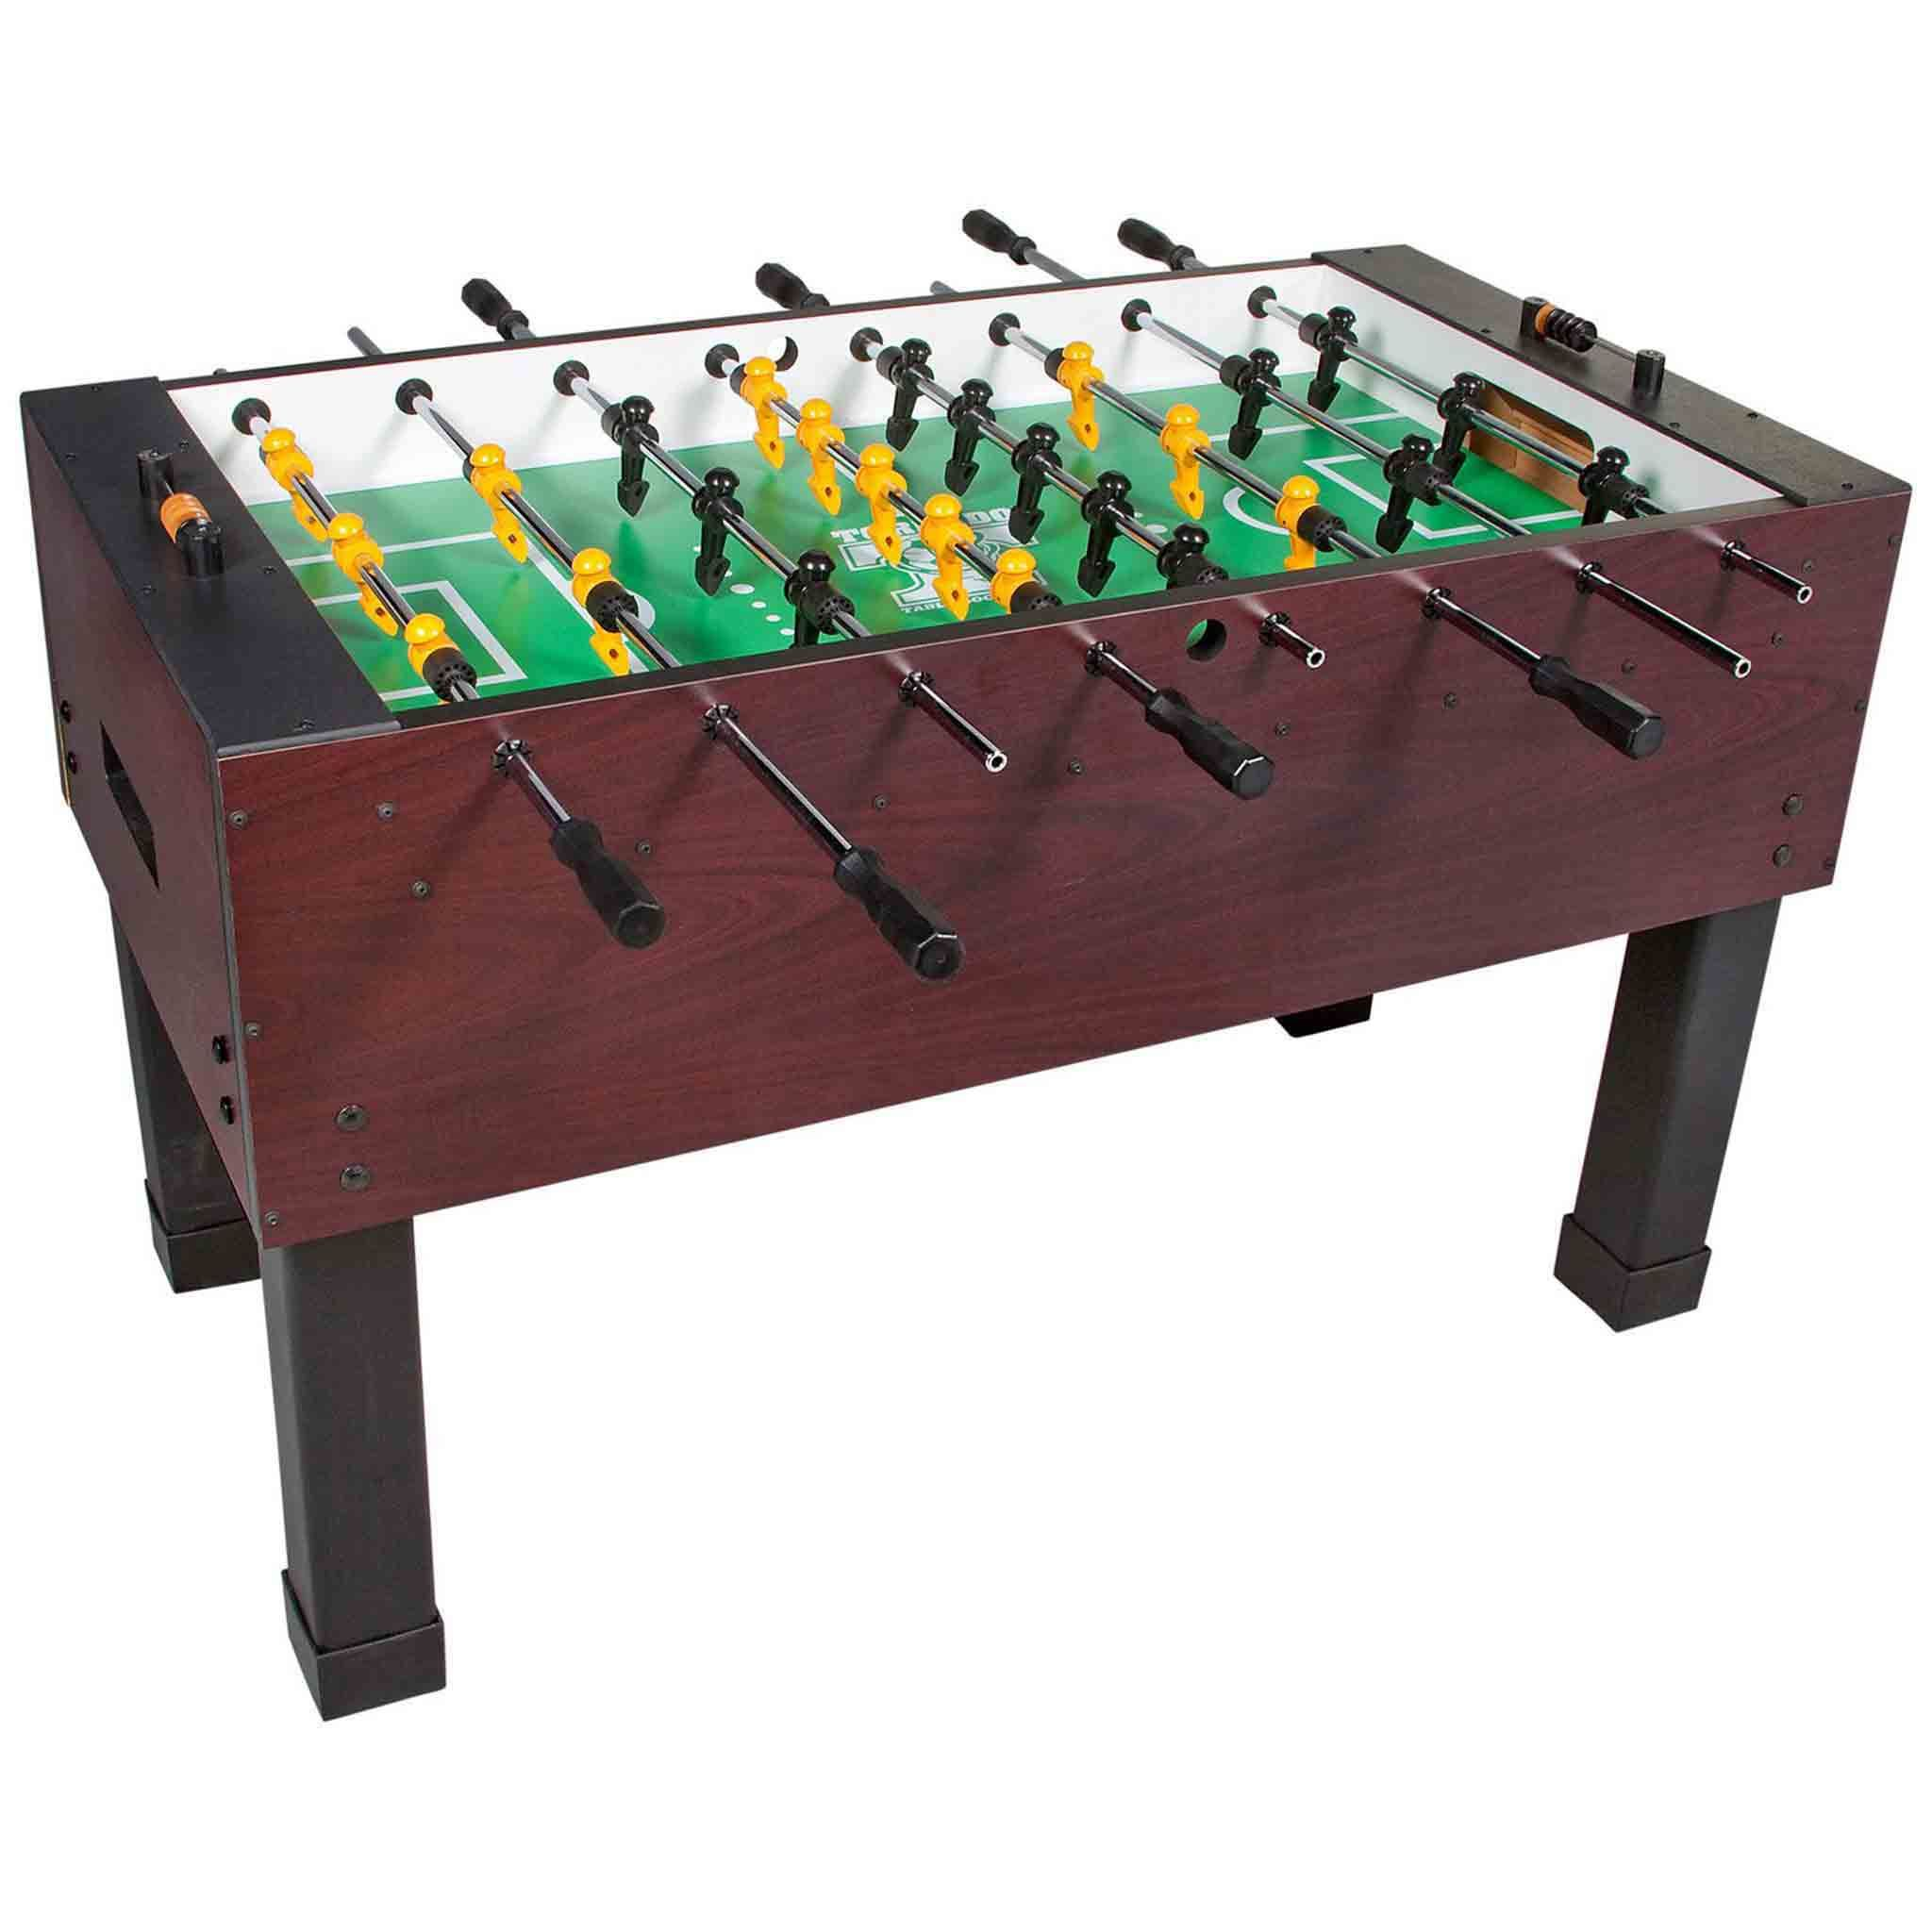 Tornado Sport Foosball Table Httpwwwfoosballnationcom Free - Foosball table price